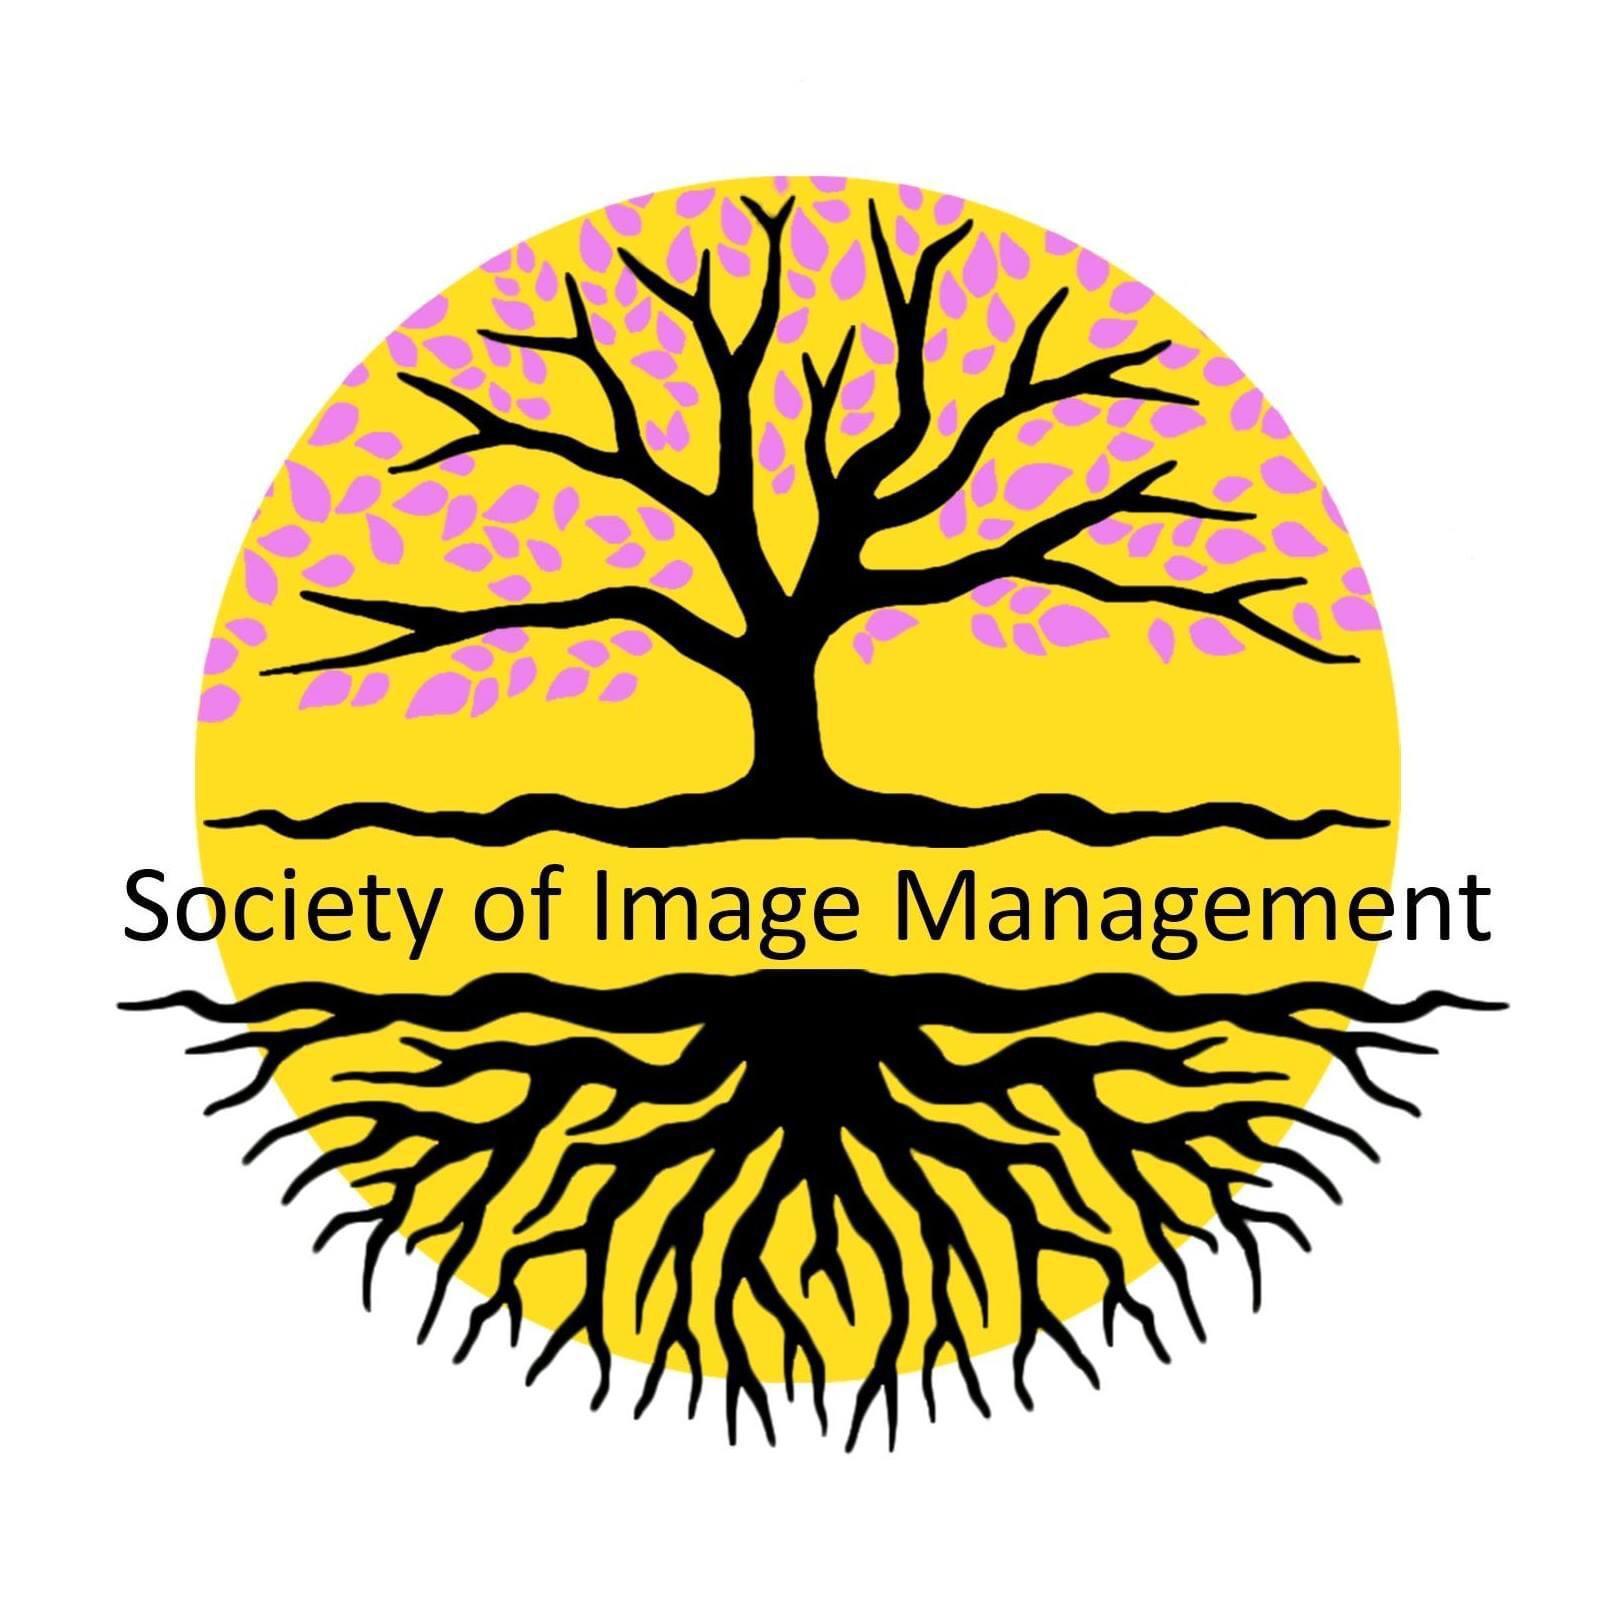 Society of Image Management